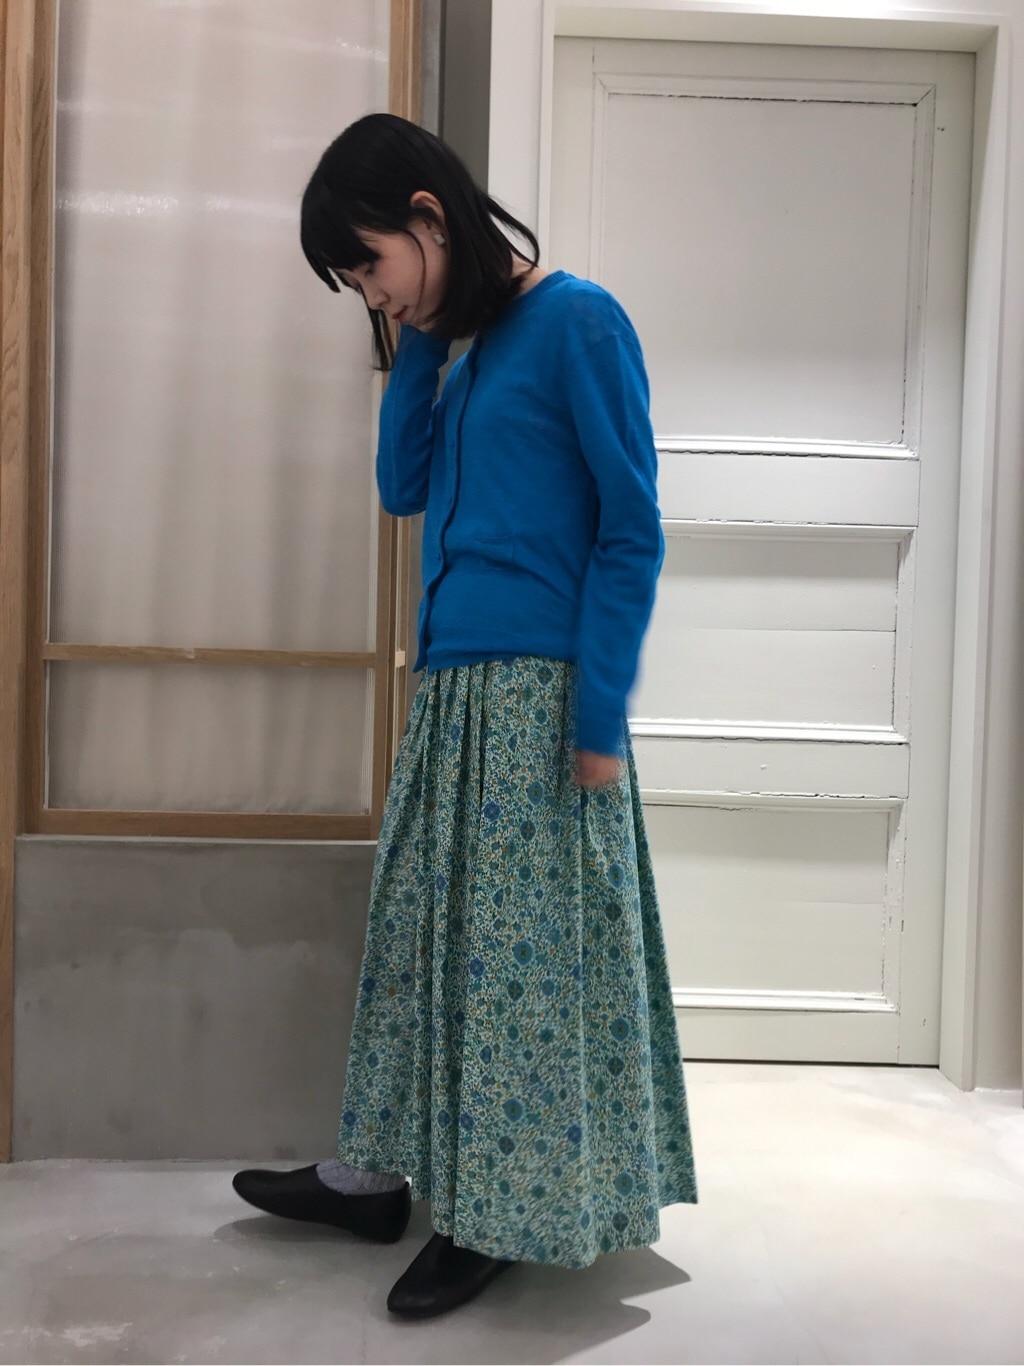 bulle de savon 渋谷スクランブルスクエア 身長:153cm 2020.02.23